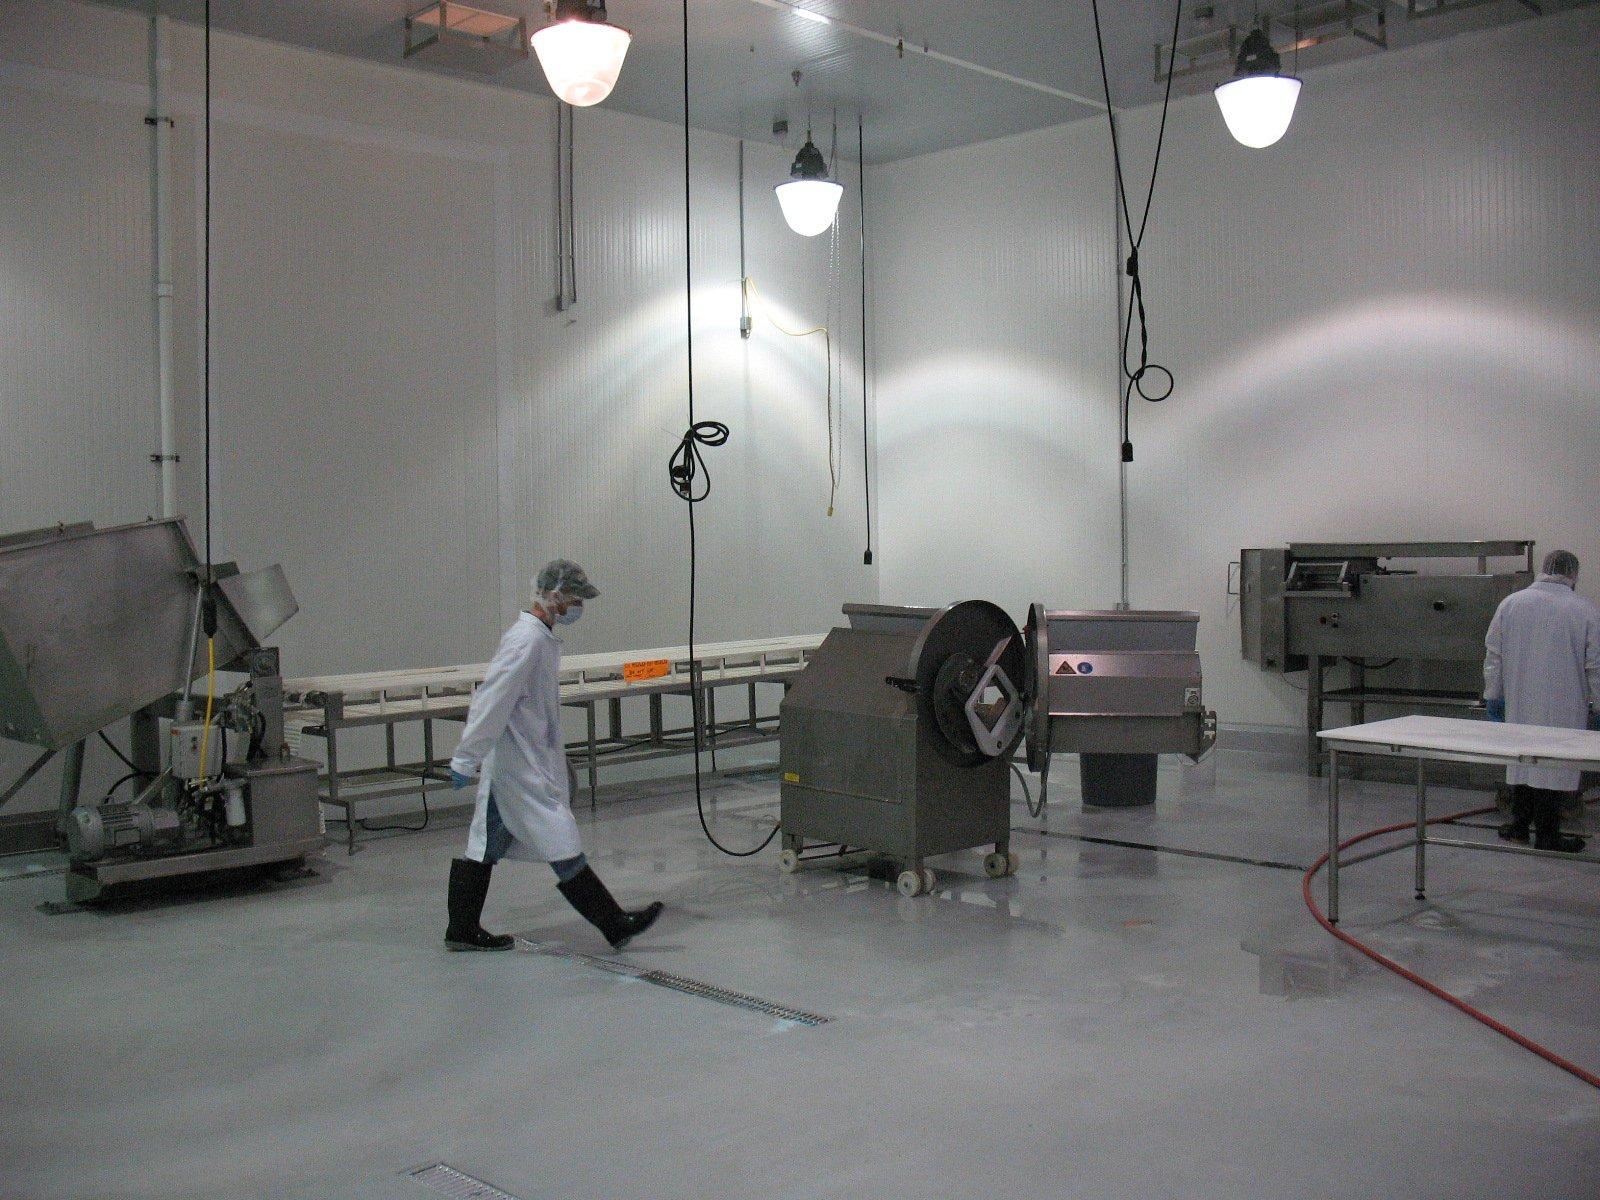 Transparante epoxy coatingvloer als productievloer